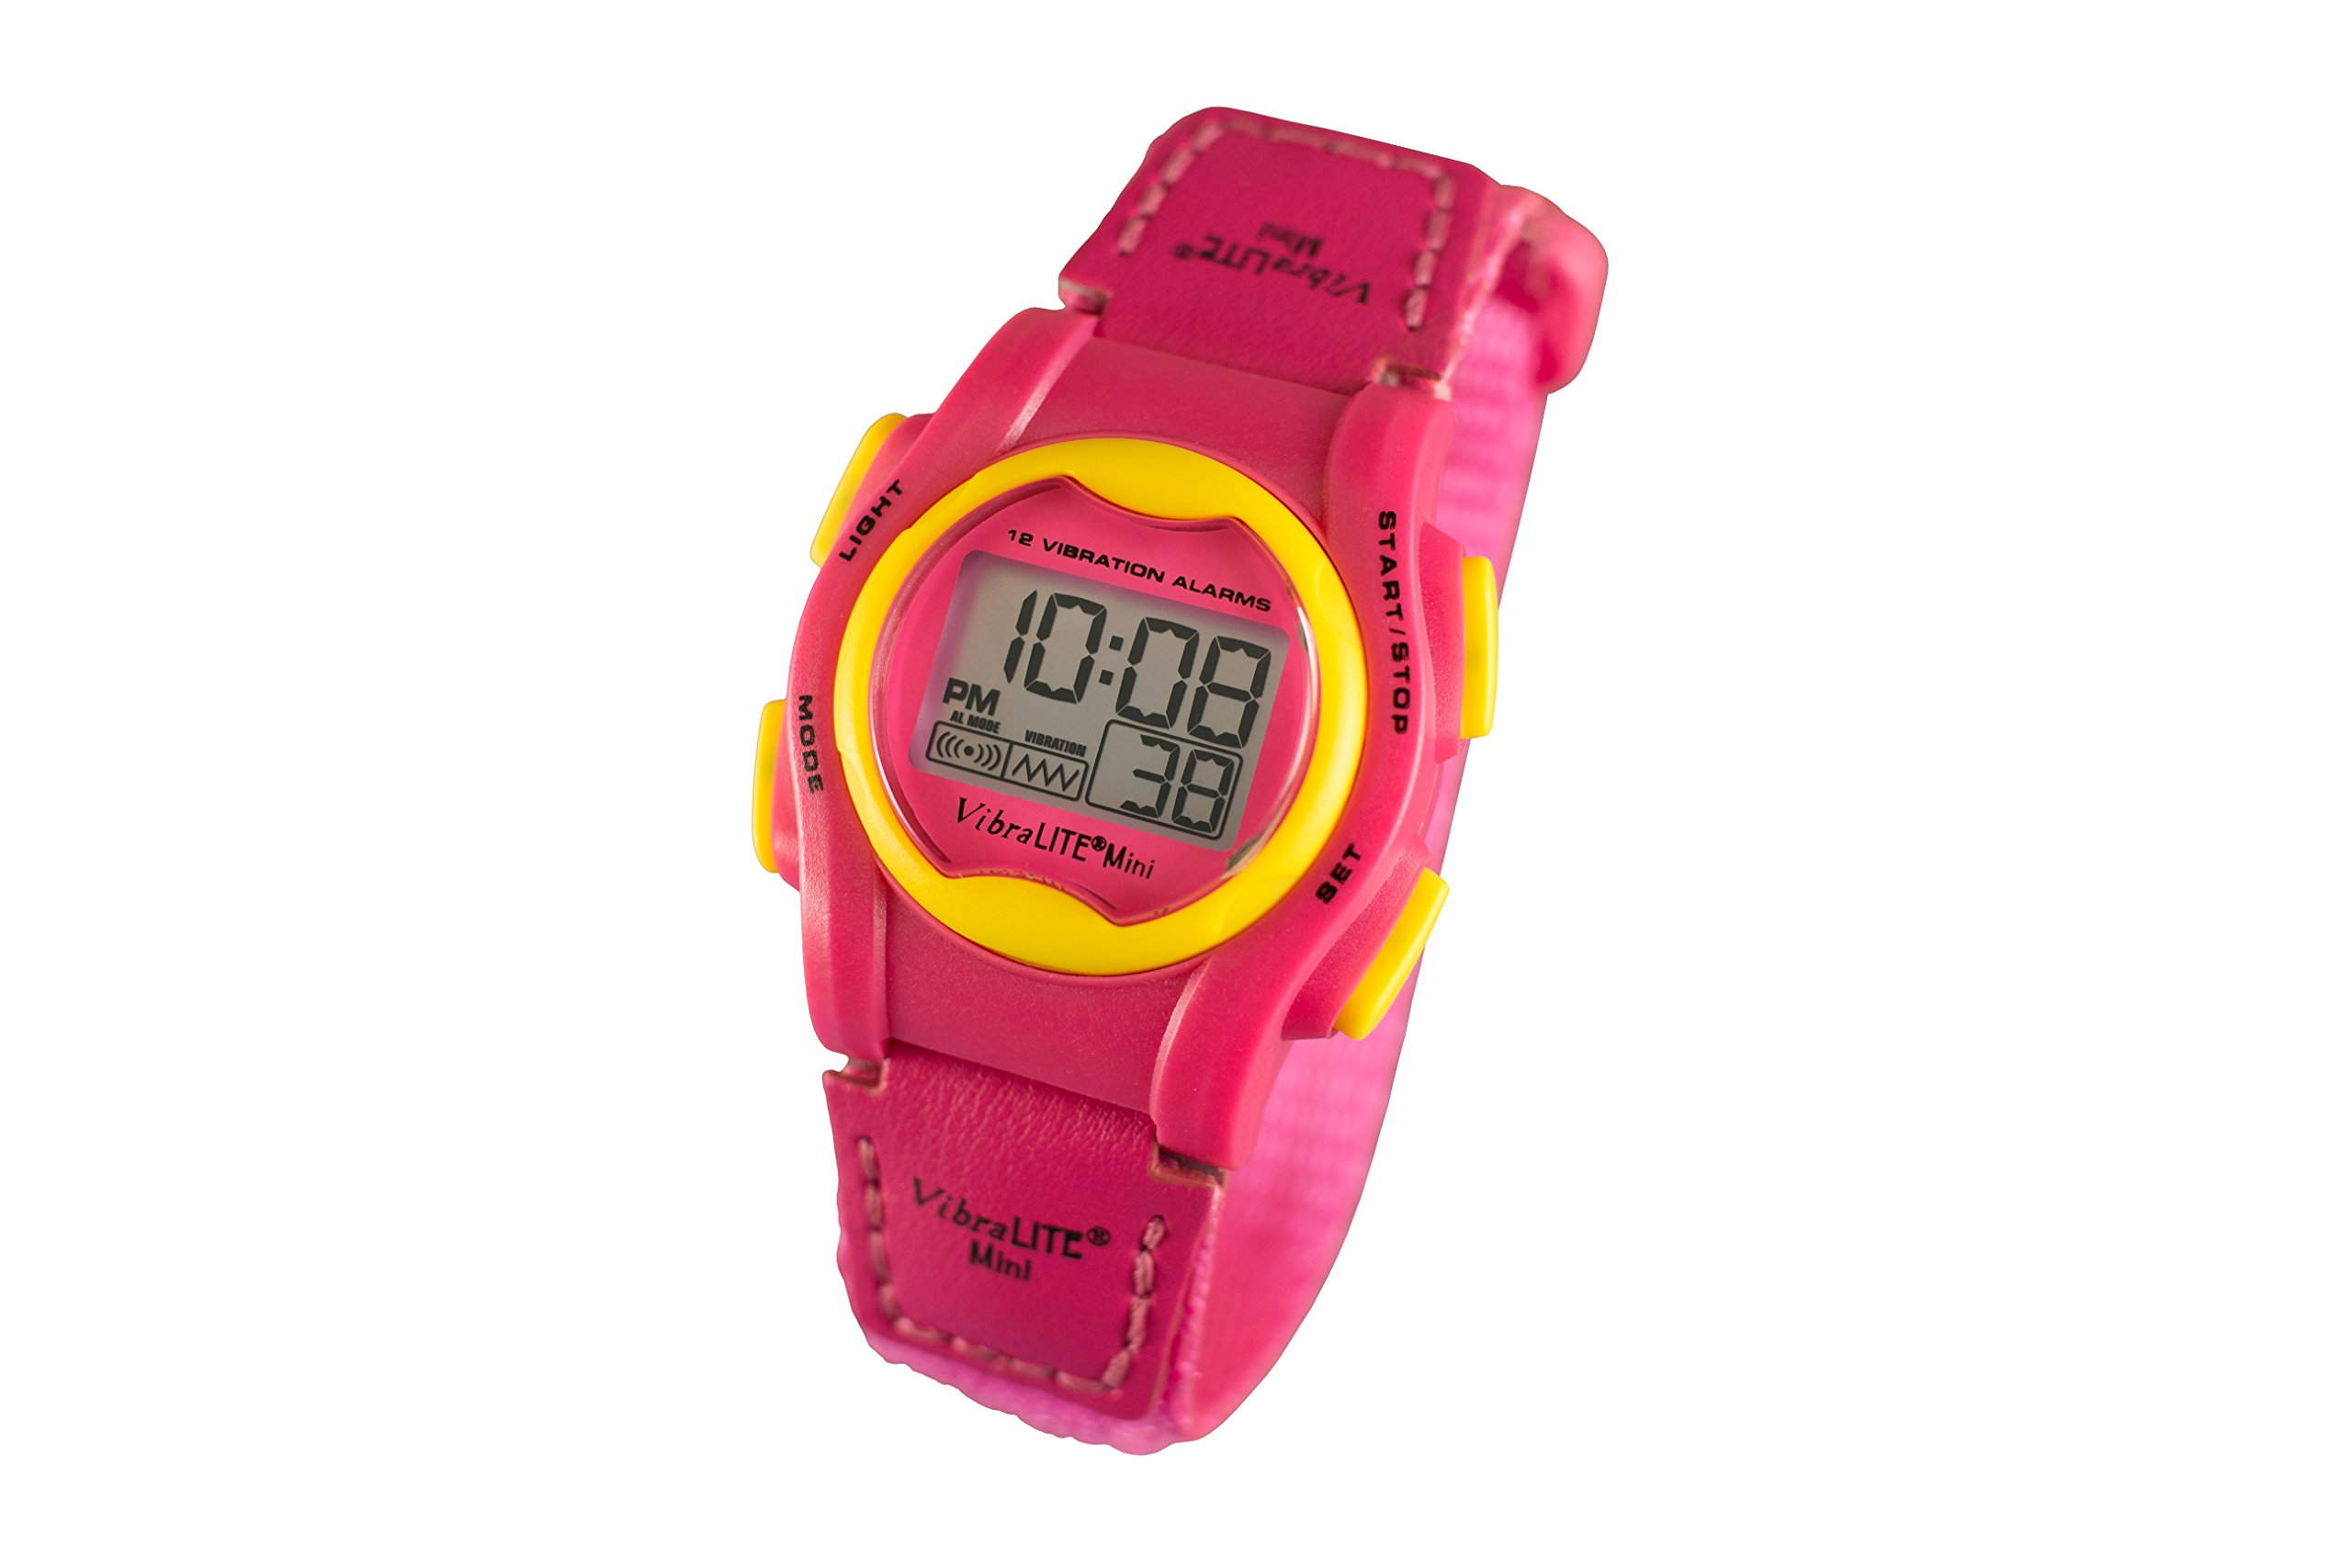 VibraLITE Mini 12-Alarm Vibrating Watch - Pink by VibraLITE